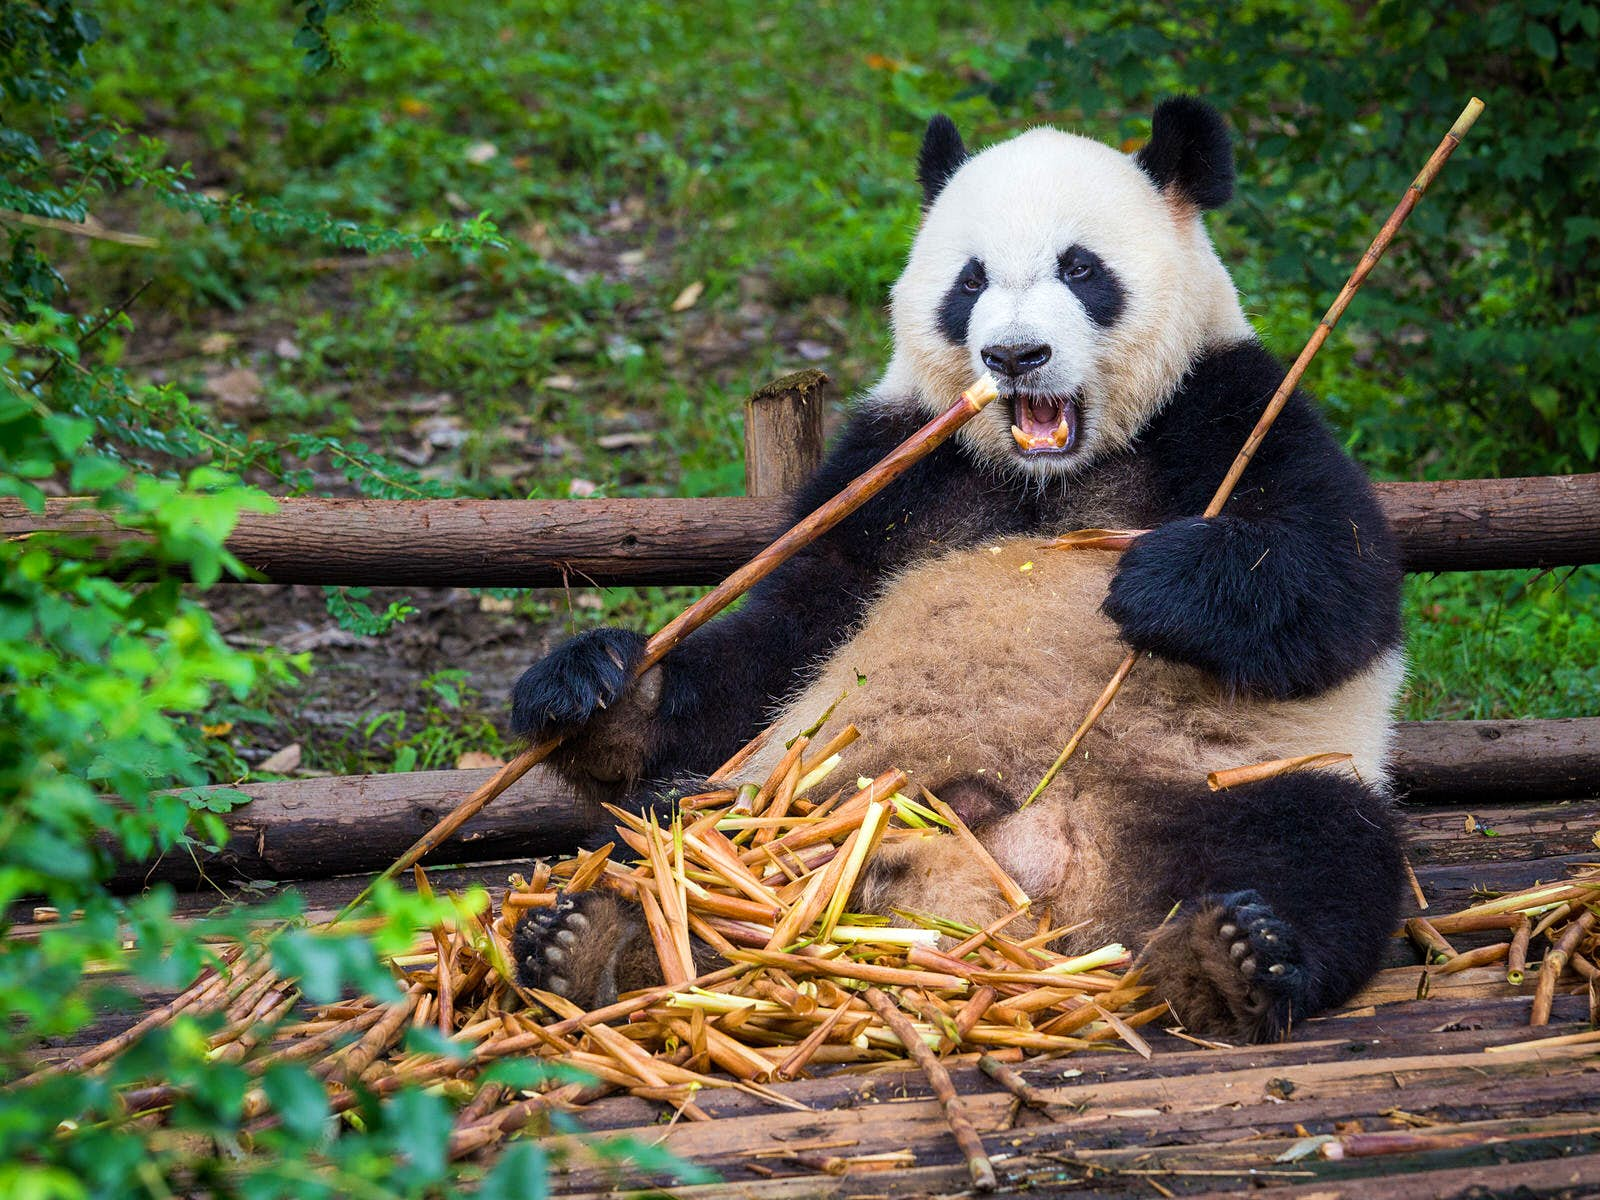 A giant panda chomps on bamboo at the panda breeding base in Chengdu © kiszon pascal / Getty